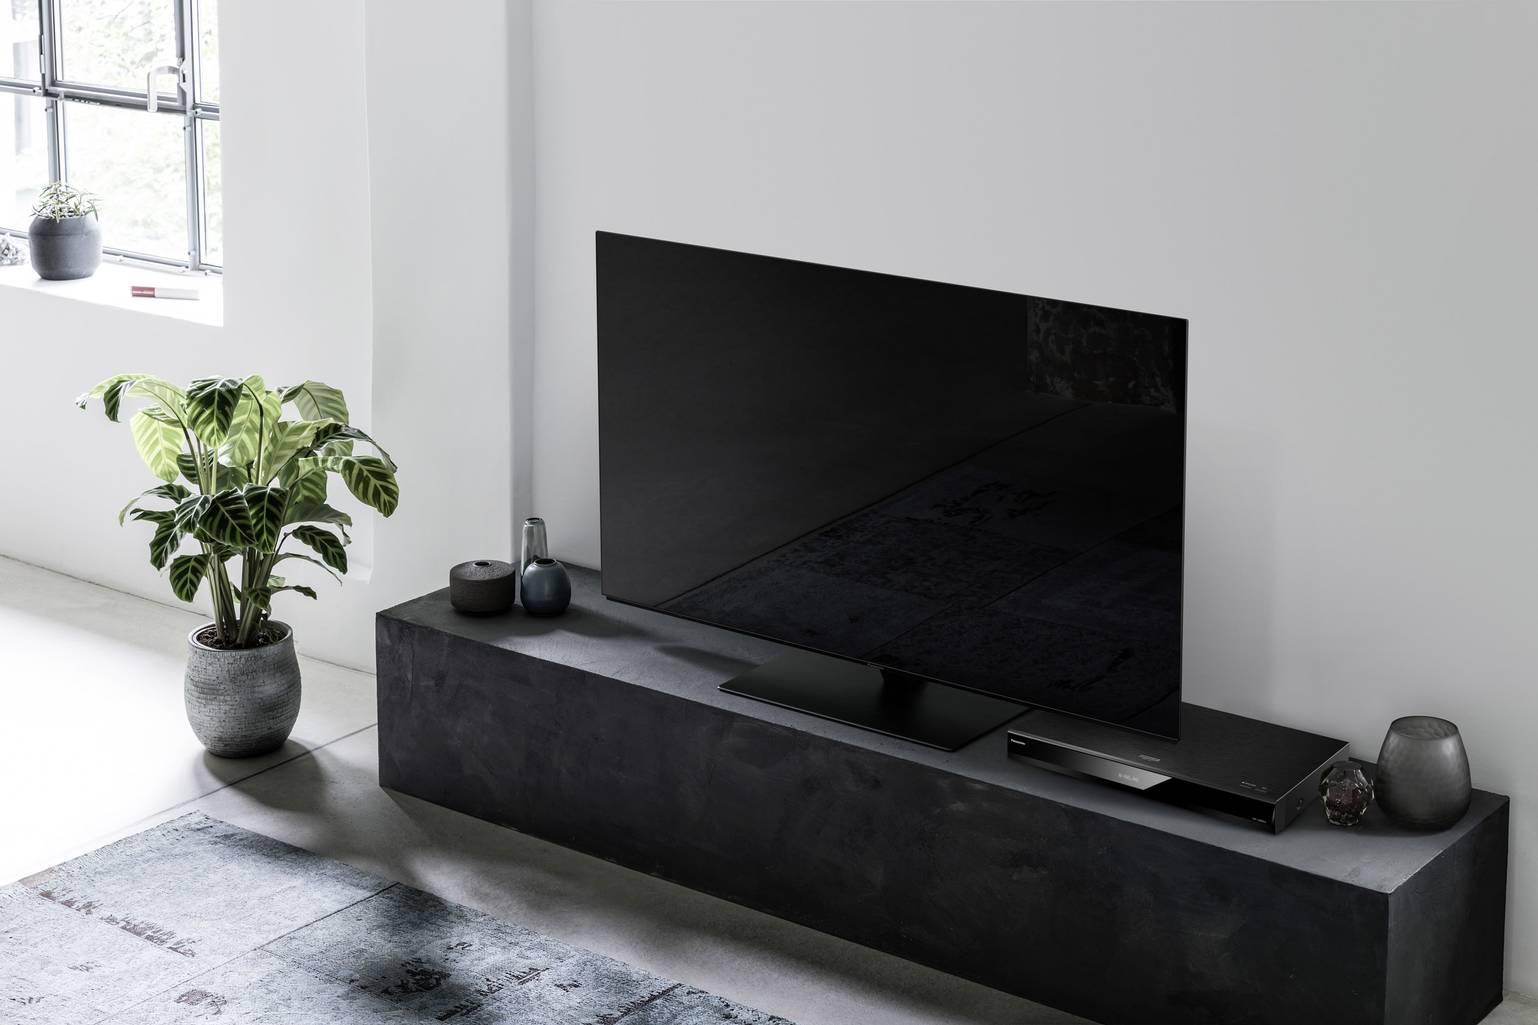 uhd-blu-ray-player-panasonic-dp-ub824-4k-upscaling-wi-fi-smart-tv-amazon-alexa-support-google-assistant-support-black